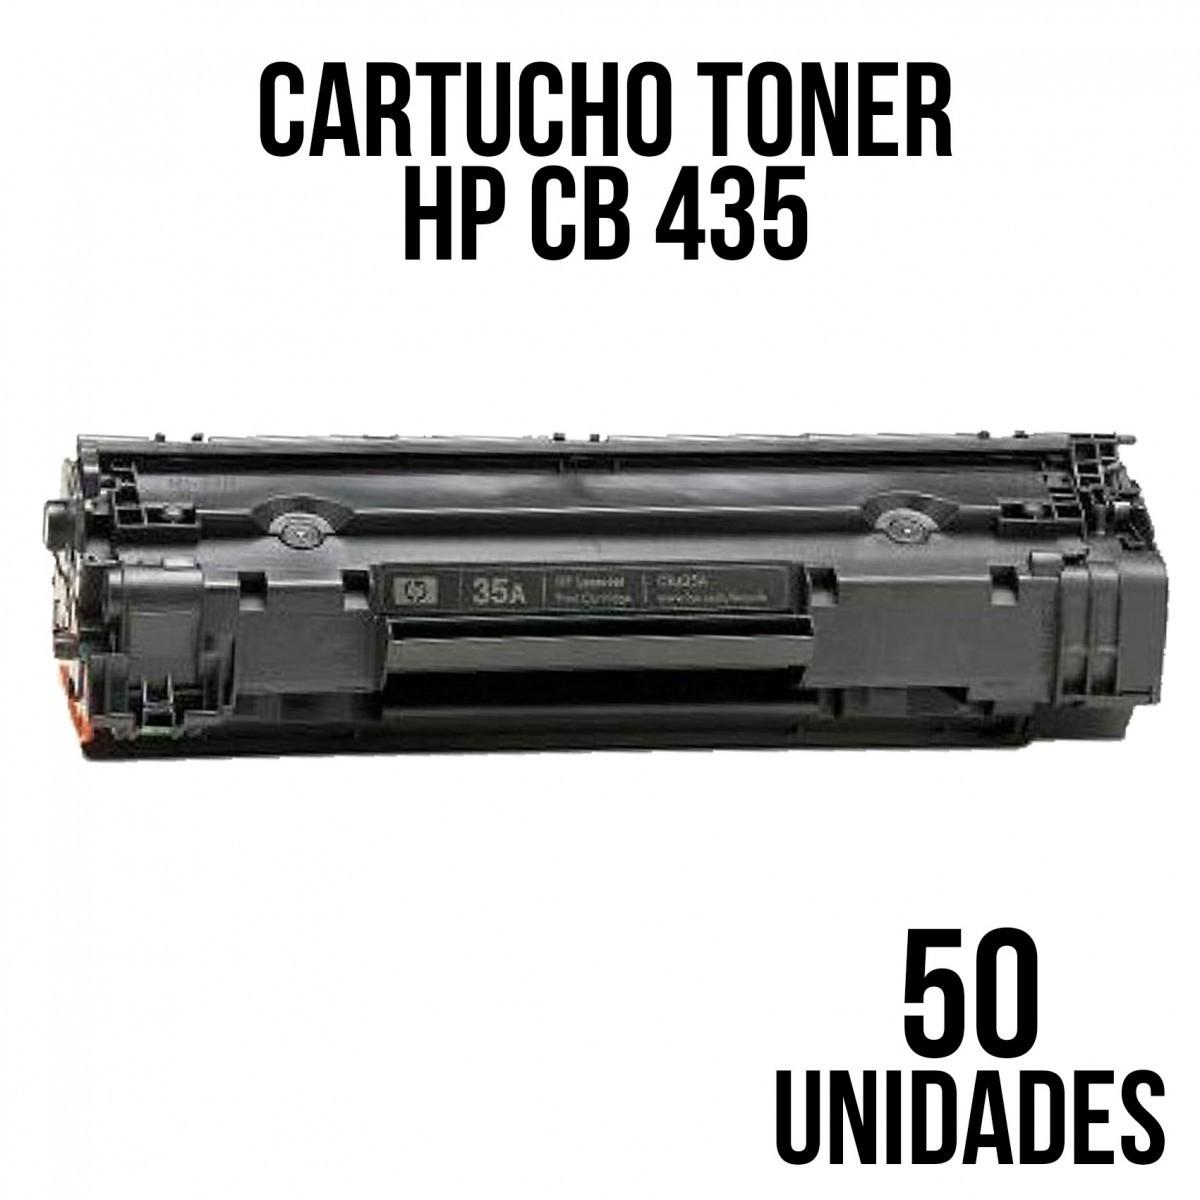 TONER HP 285 / 85a / CE285 / 278 / 85 / 436 / 435/ P1005 / 1006 / 1505 / 1505N / M1552N / COMPATIVEL 50 UNIDADES